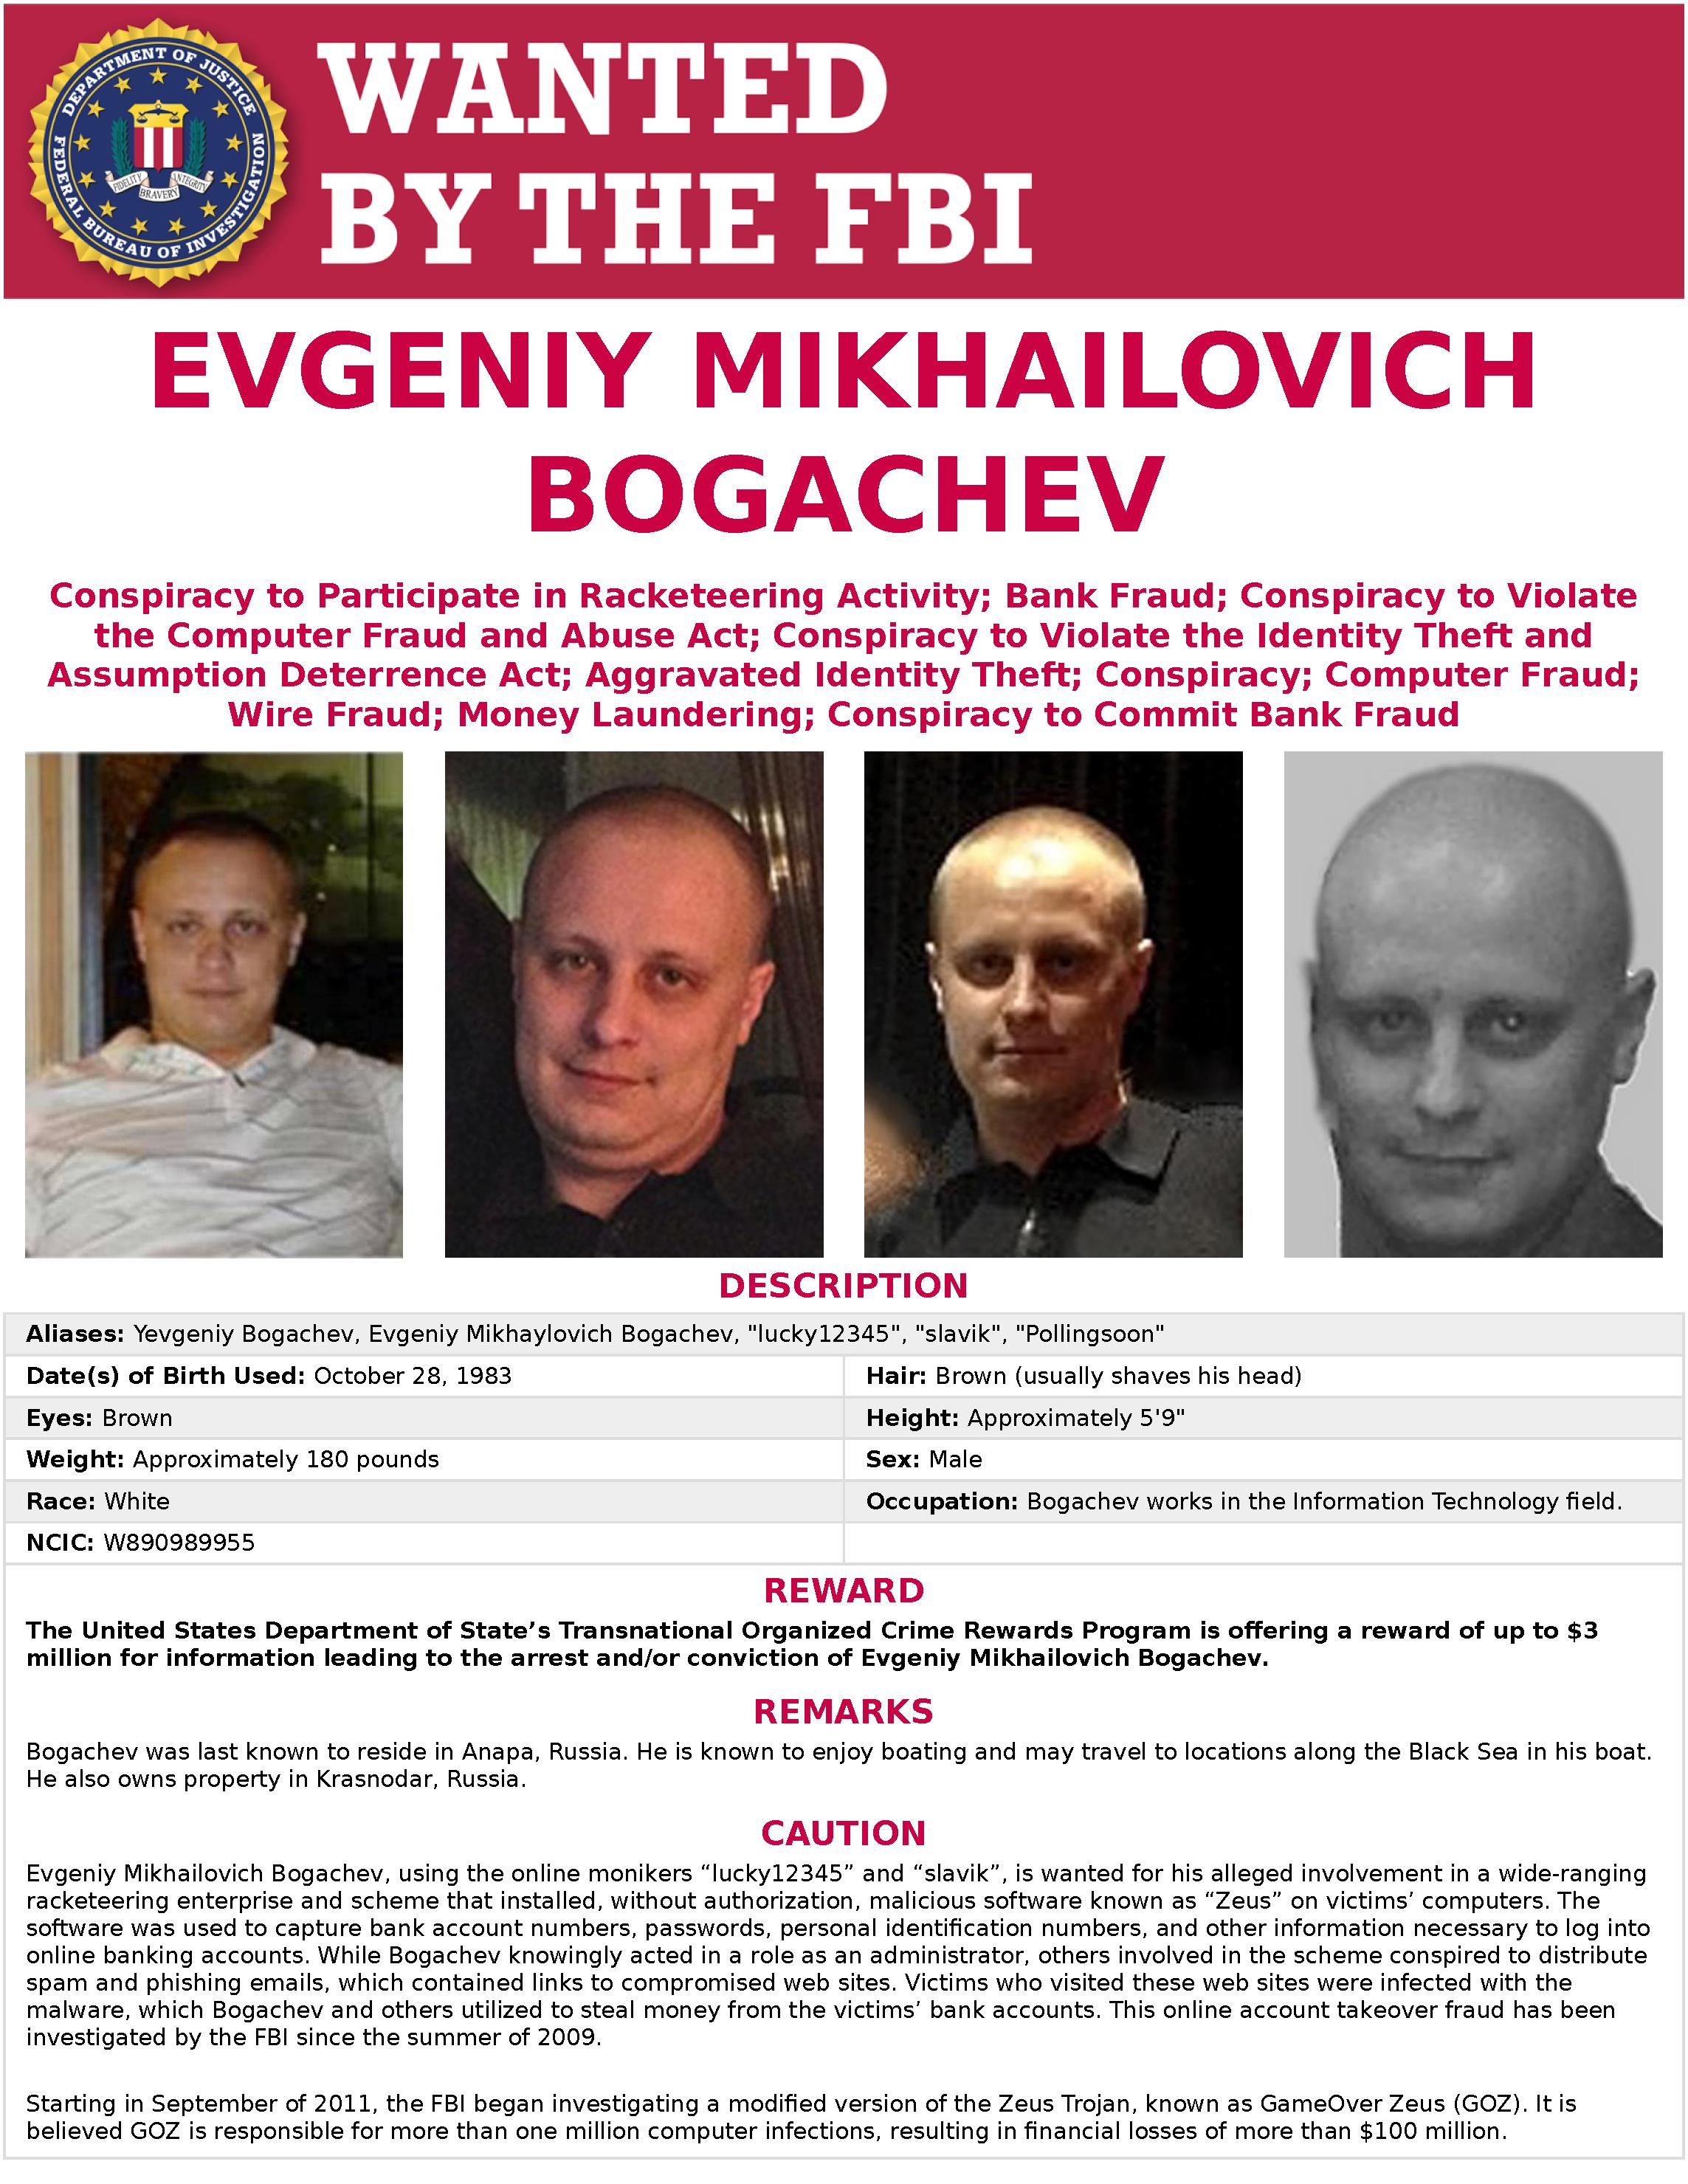 Bogachev